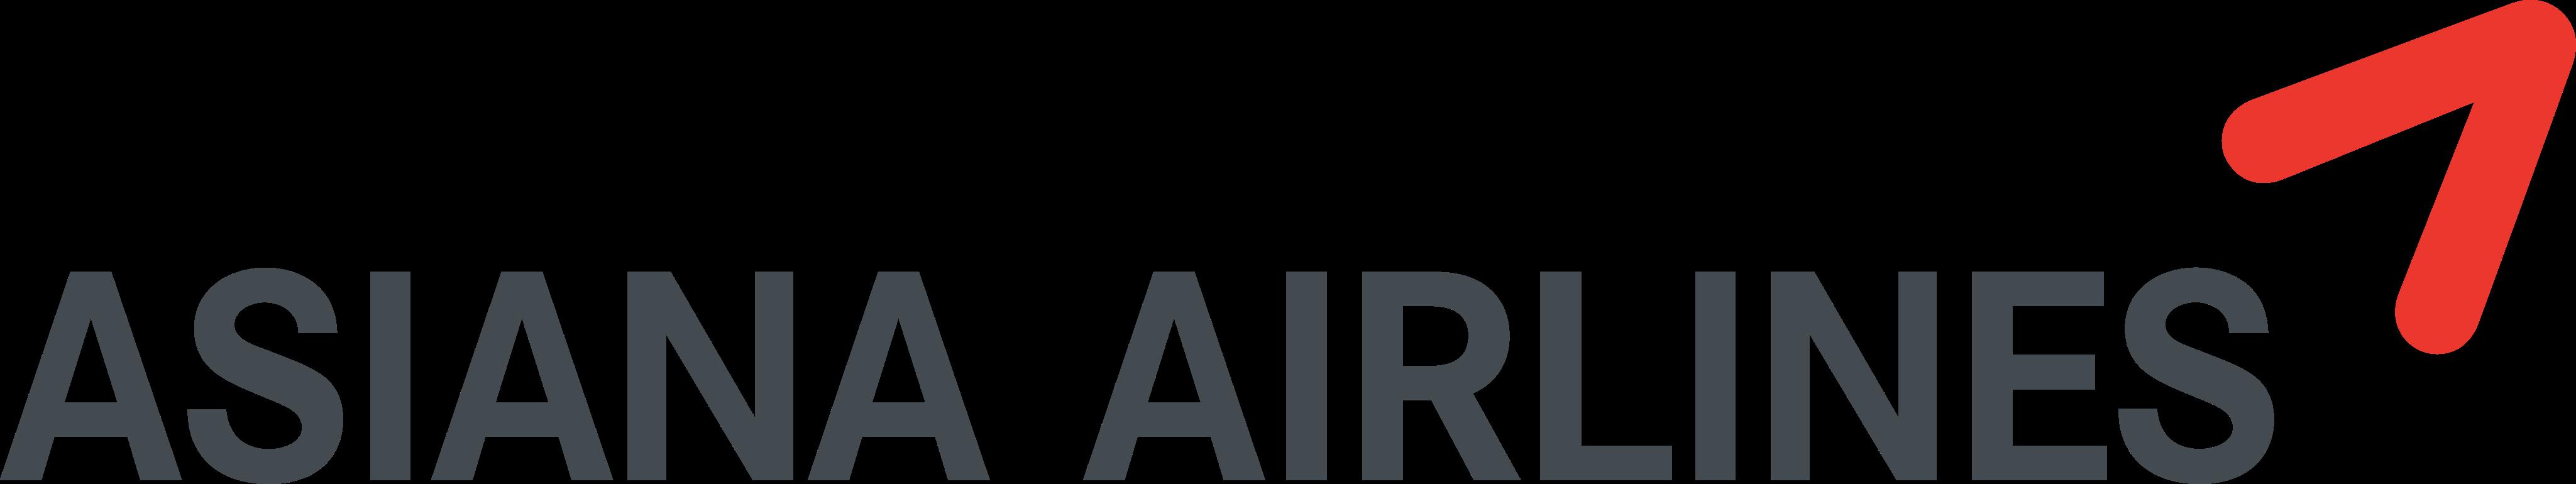 asiana airlines logo - Asiana Airlines Logo